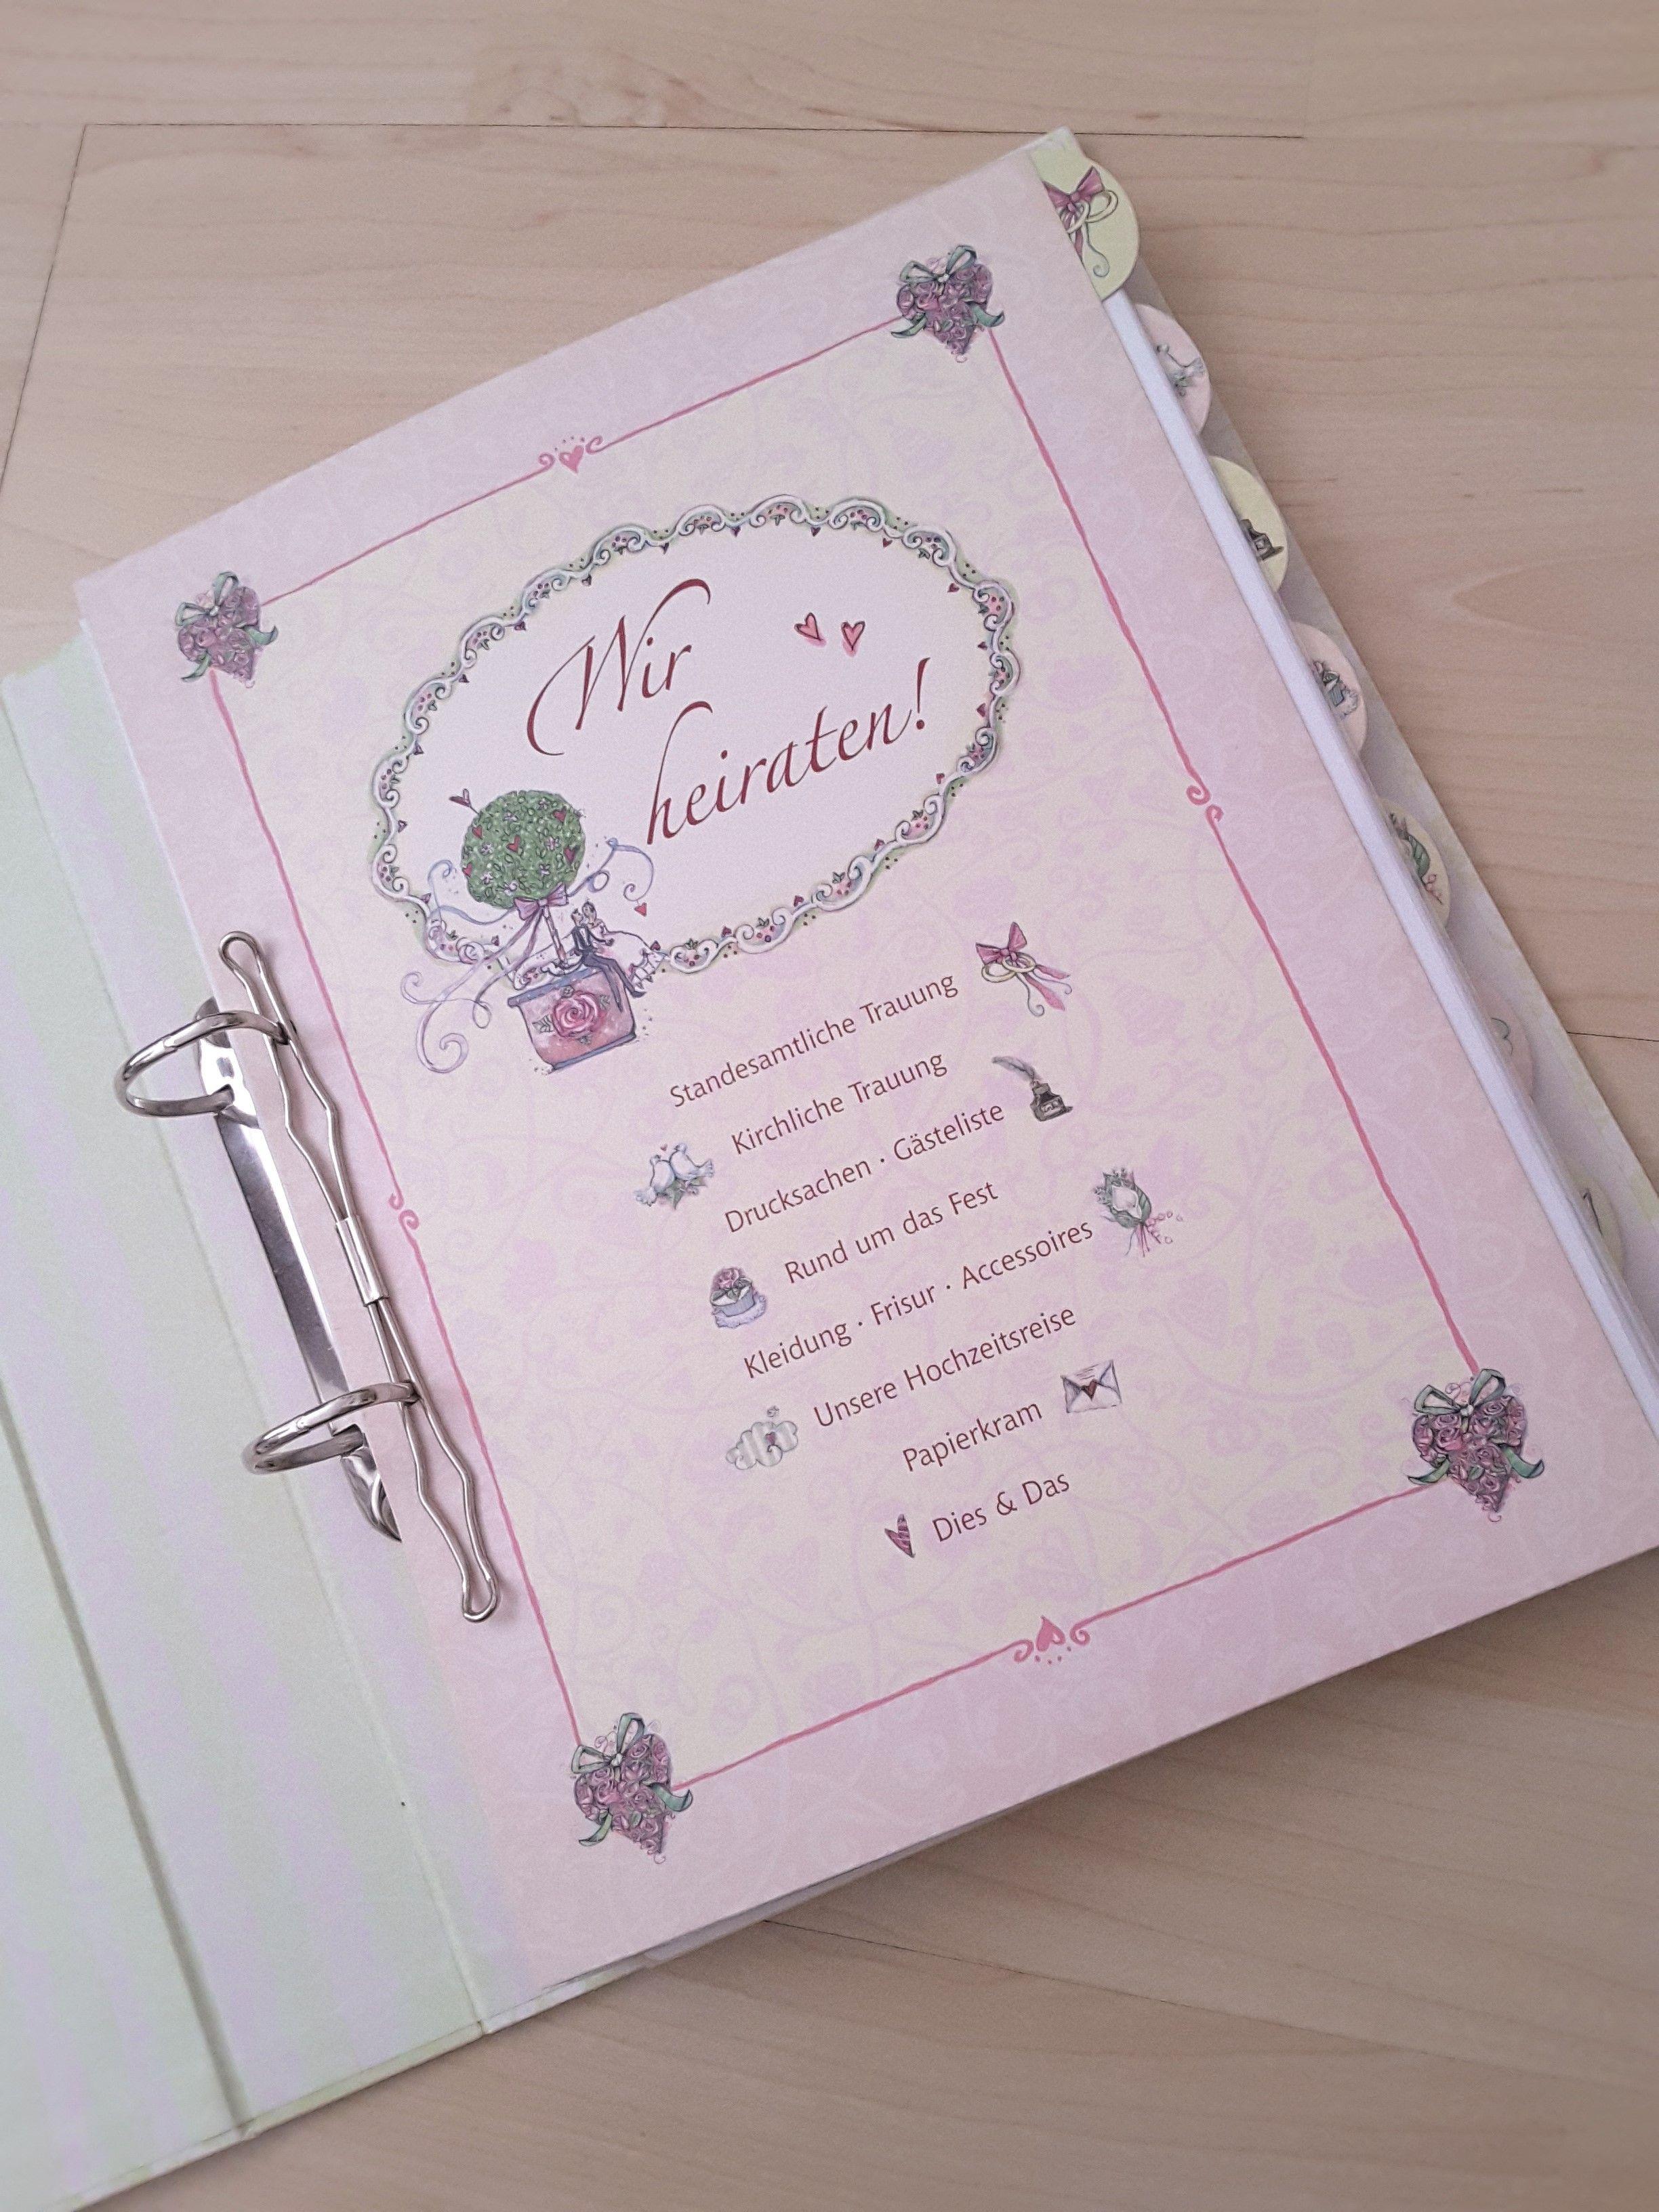 media image 0d 59 82 Hochzeitsordner Coppenrath Verlag